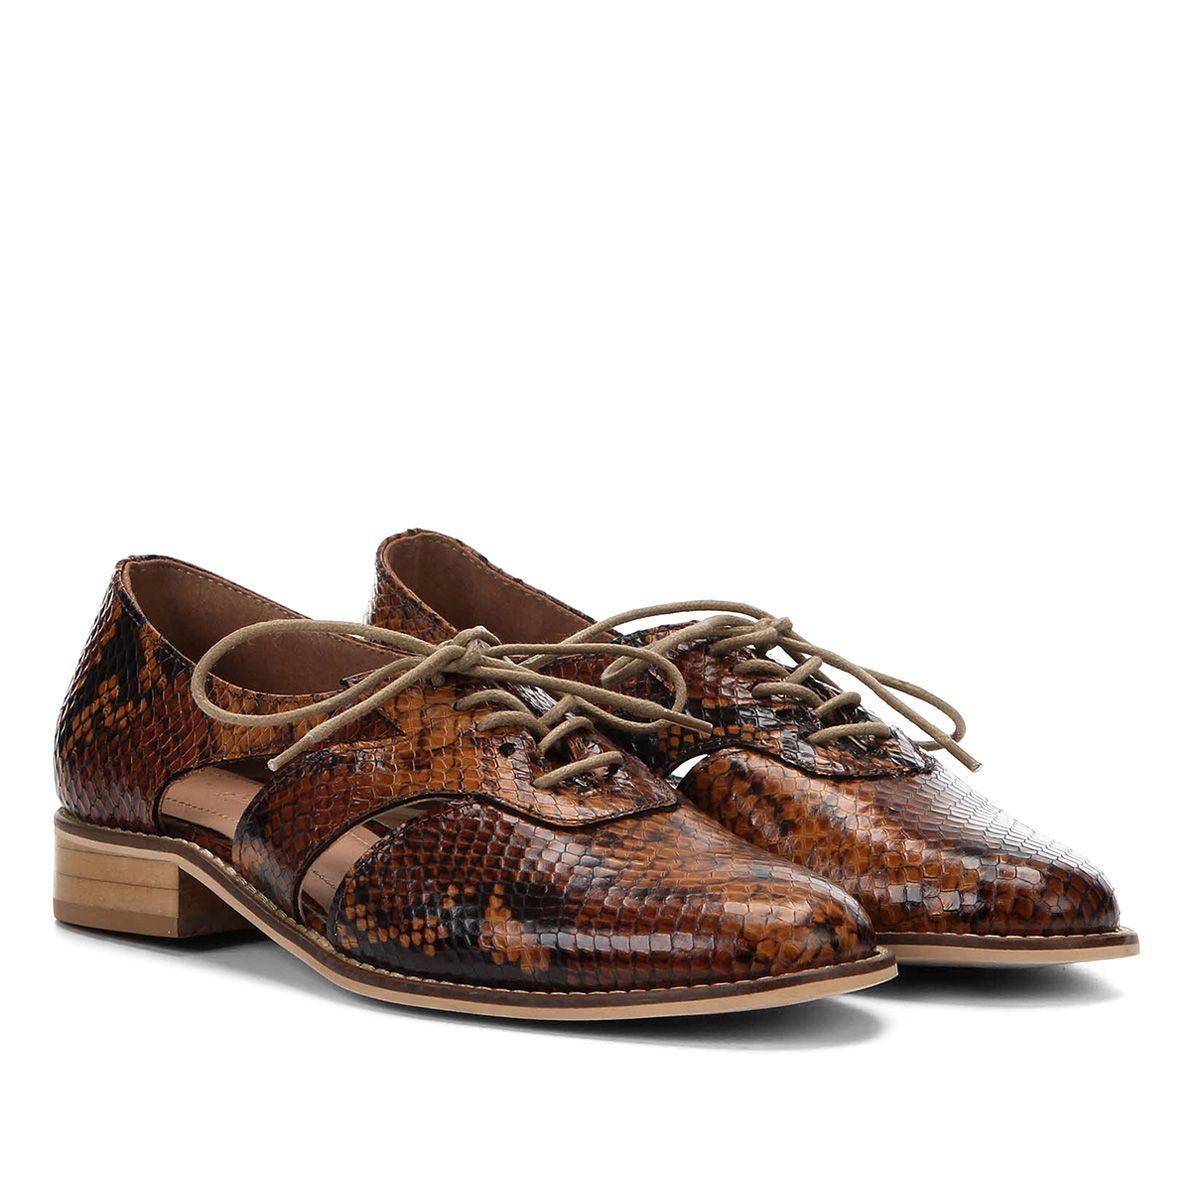 aedf4cca00 Oxford Couro Shoestock Wild Snake Feminino - Caramelo - Compre Agora ...